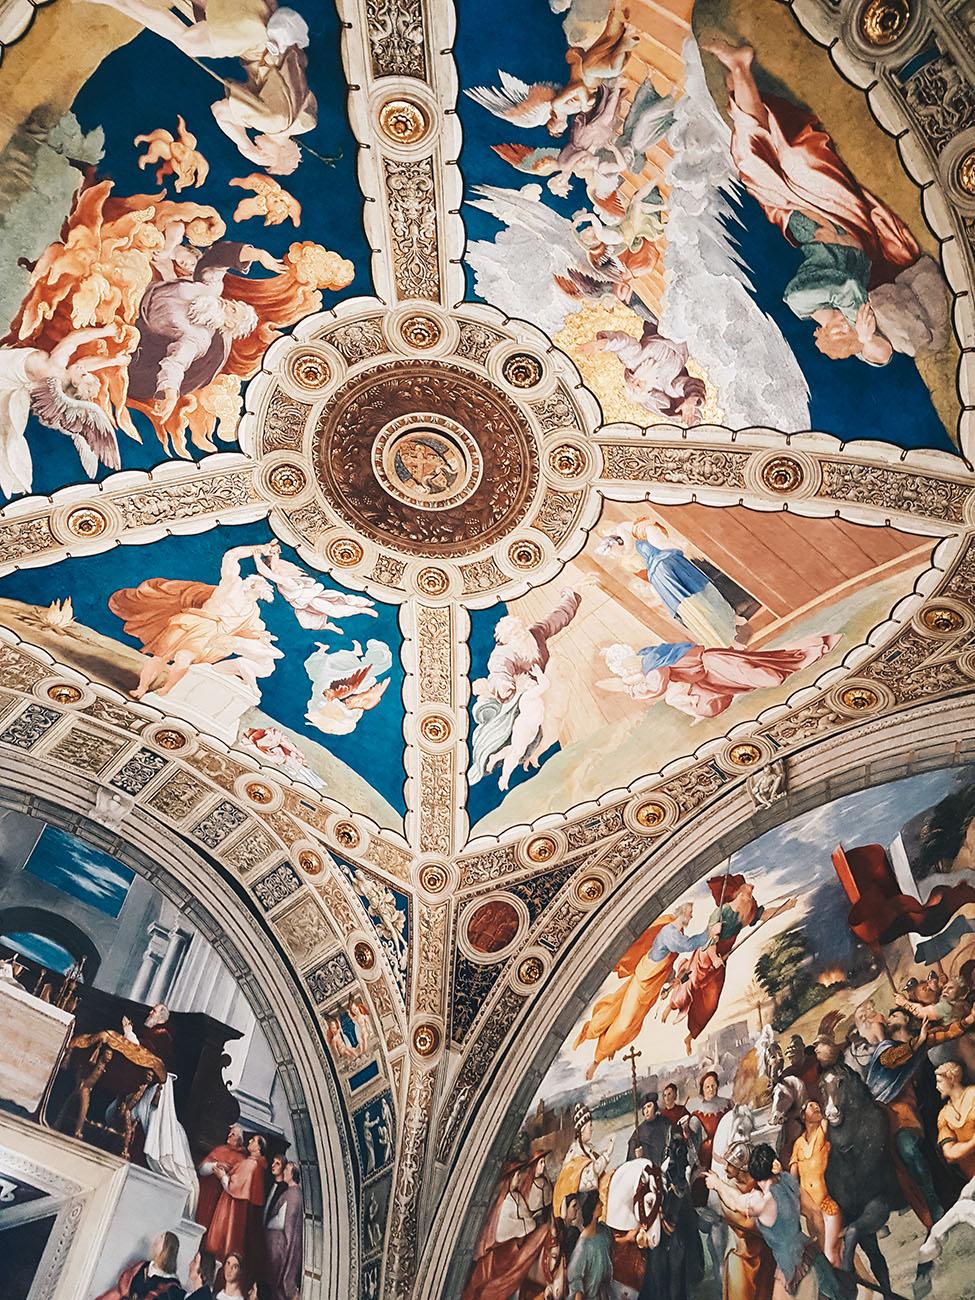 vatican, week-end à rome